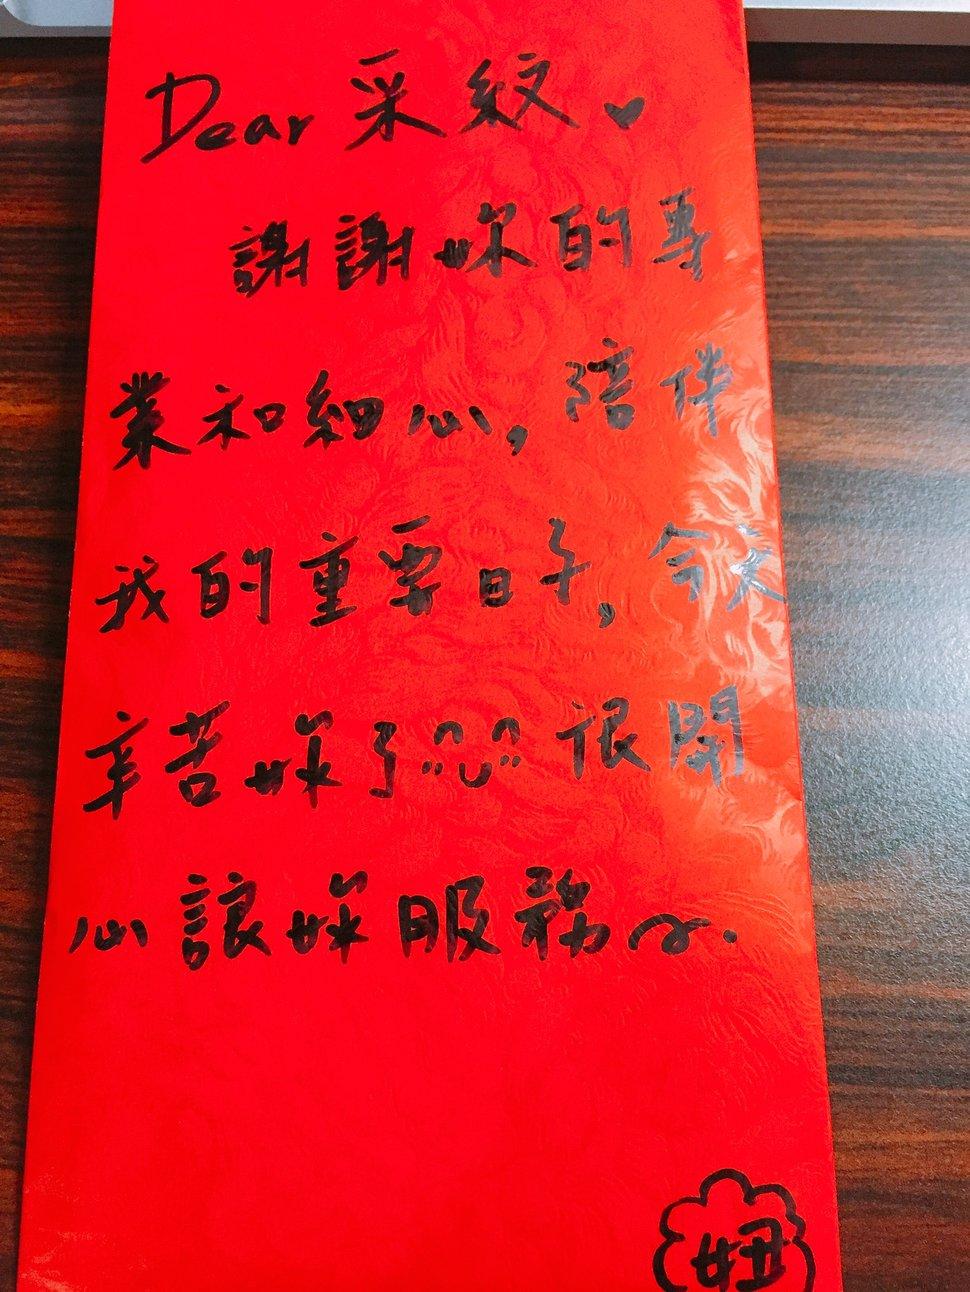 S__58712066 - 新秘采紋《結婚吧》